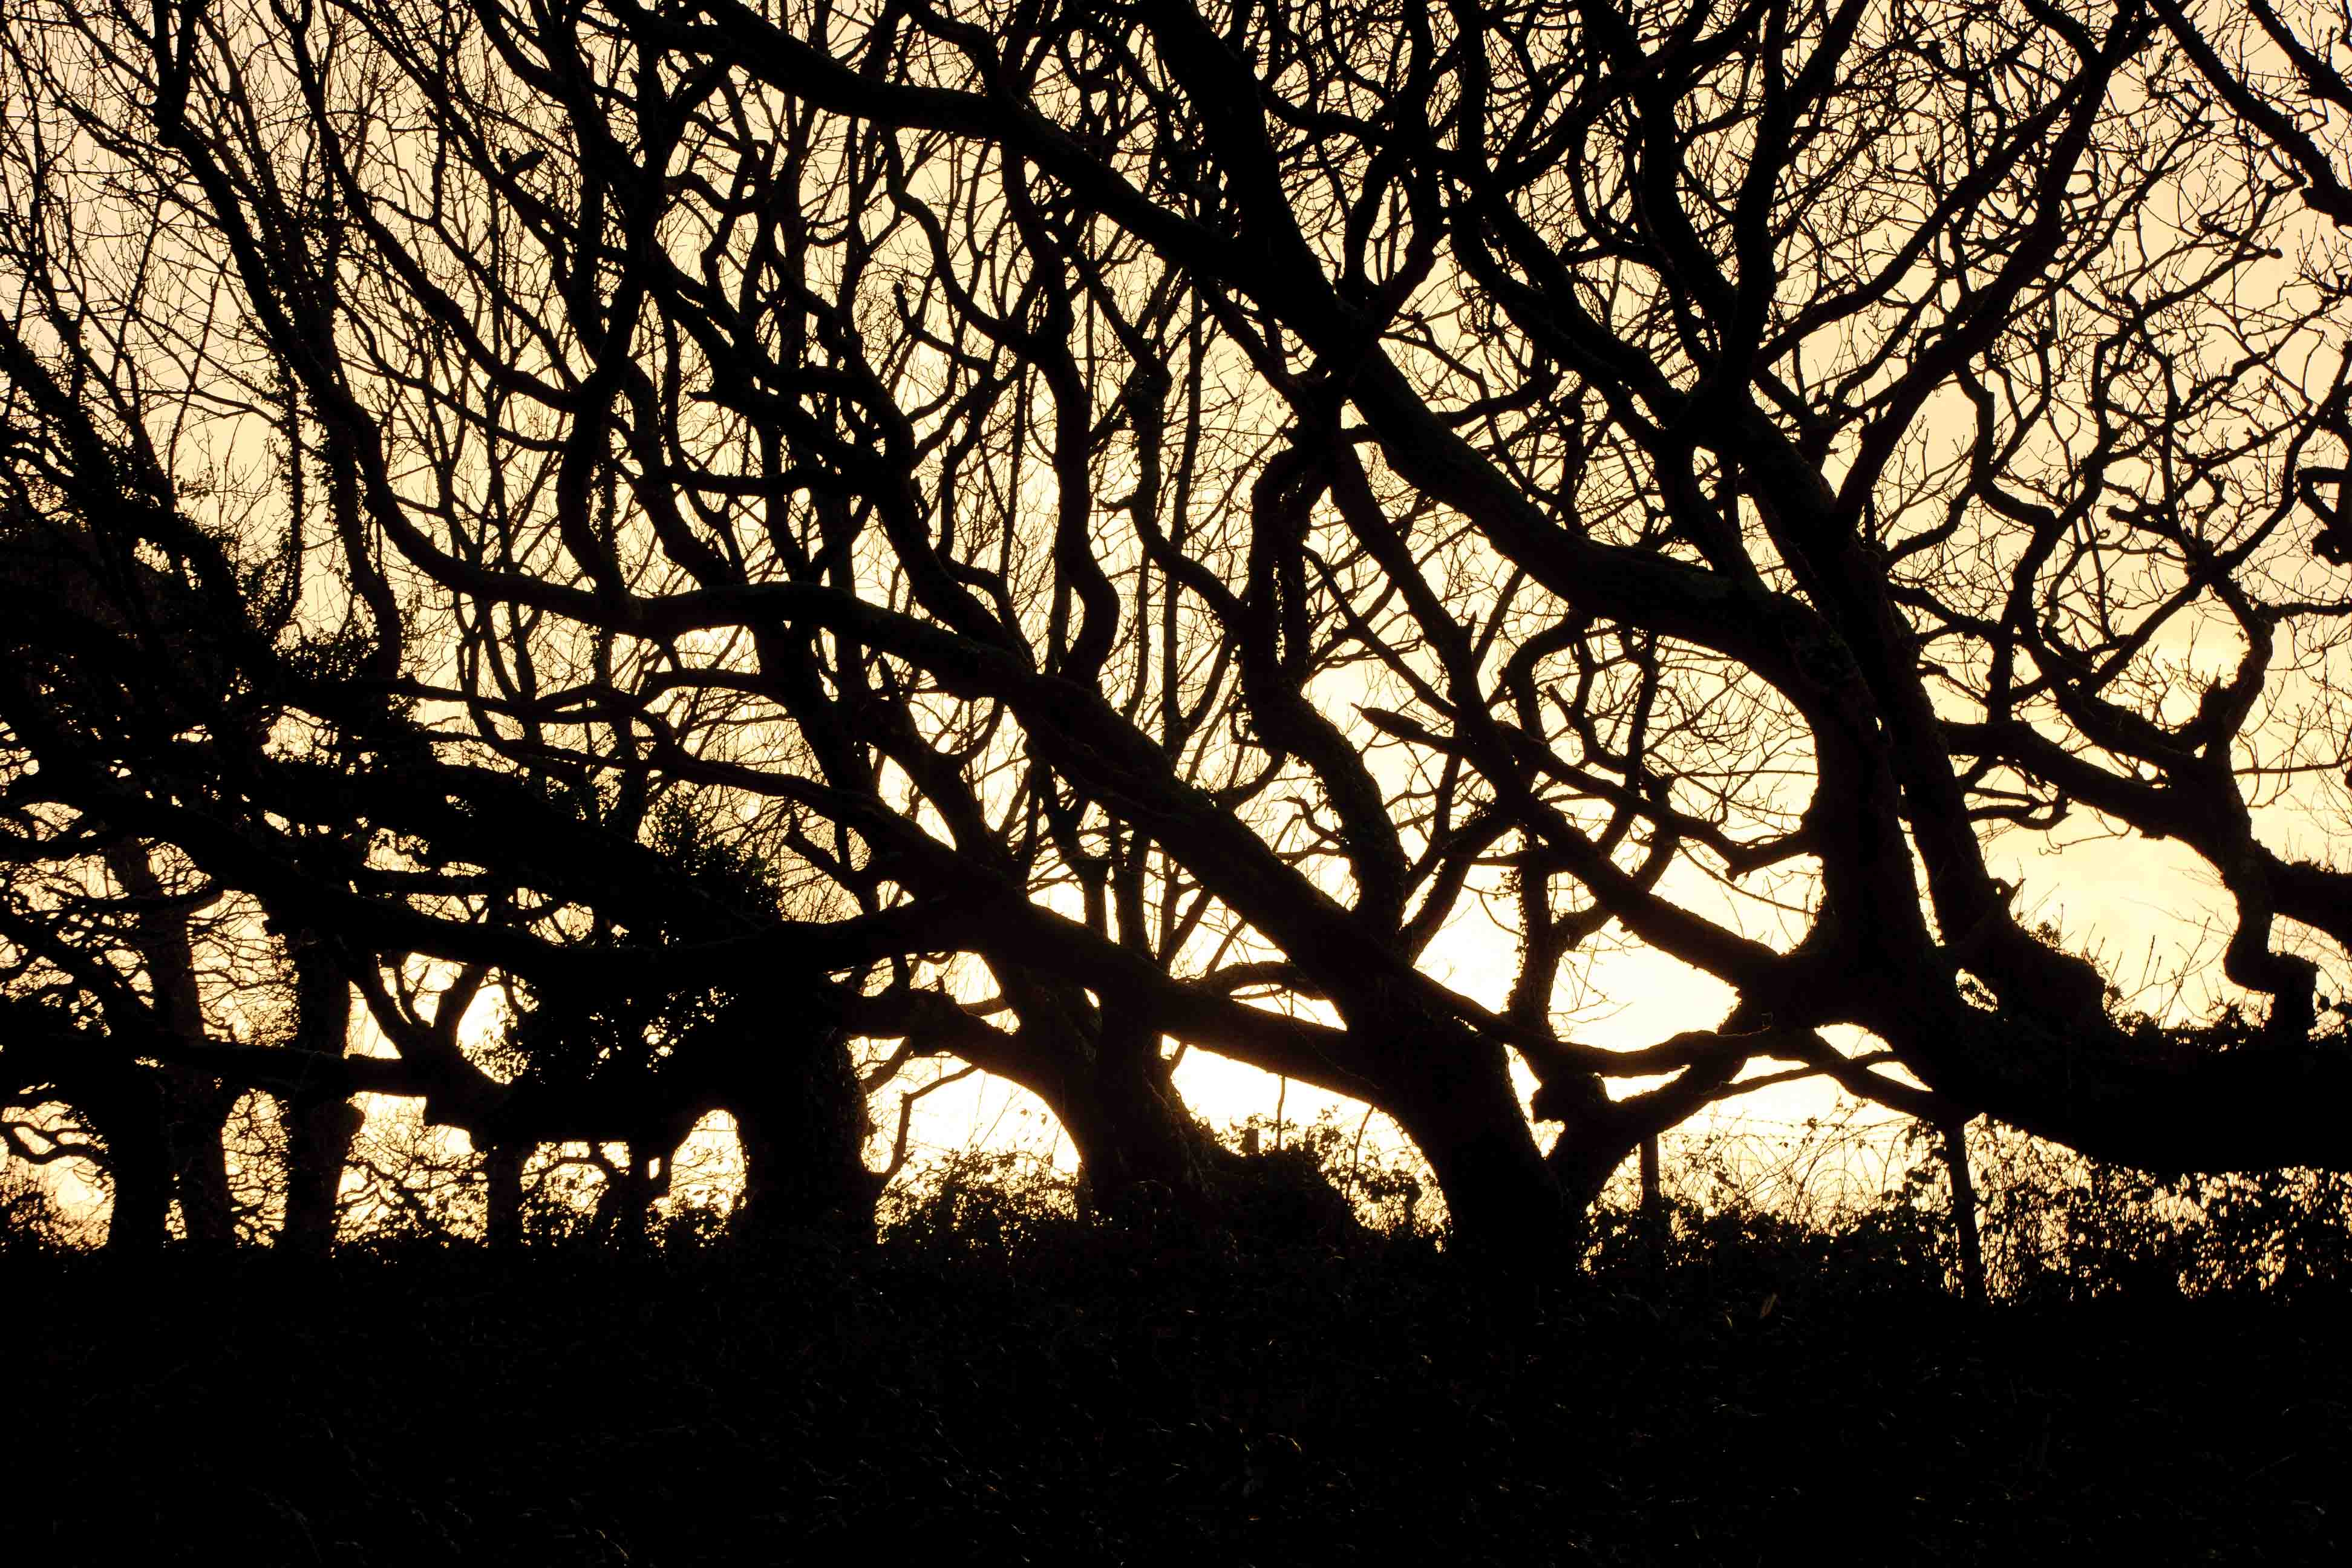 January: Chapel Wood near Georgeham